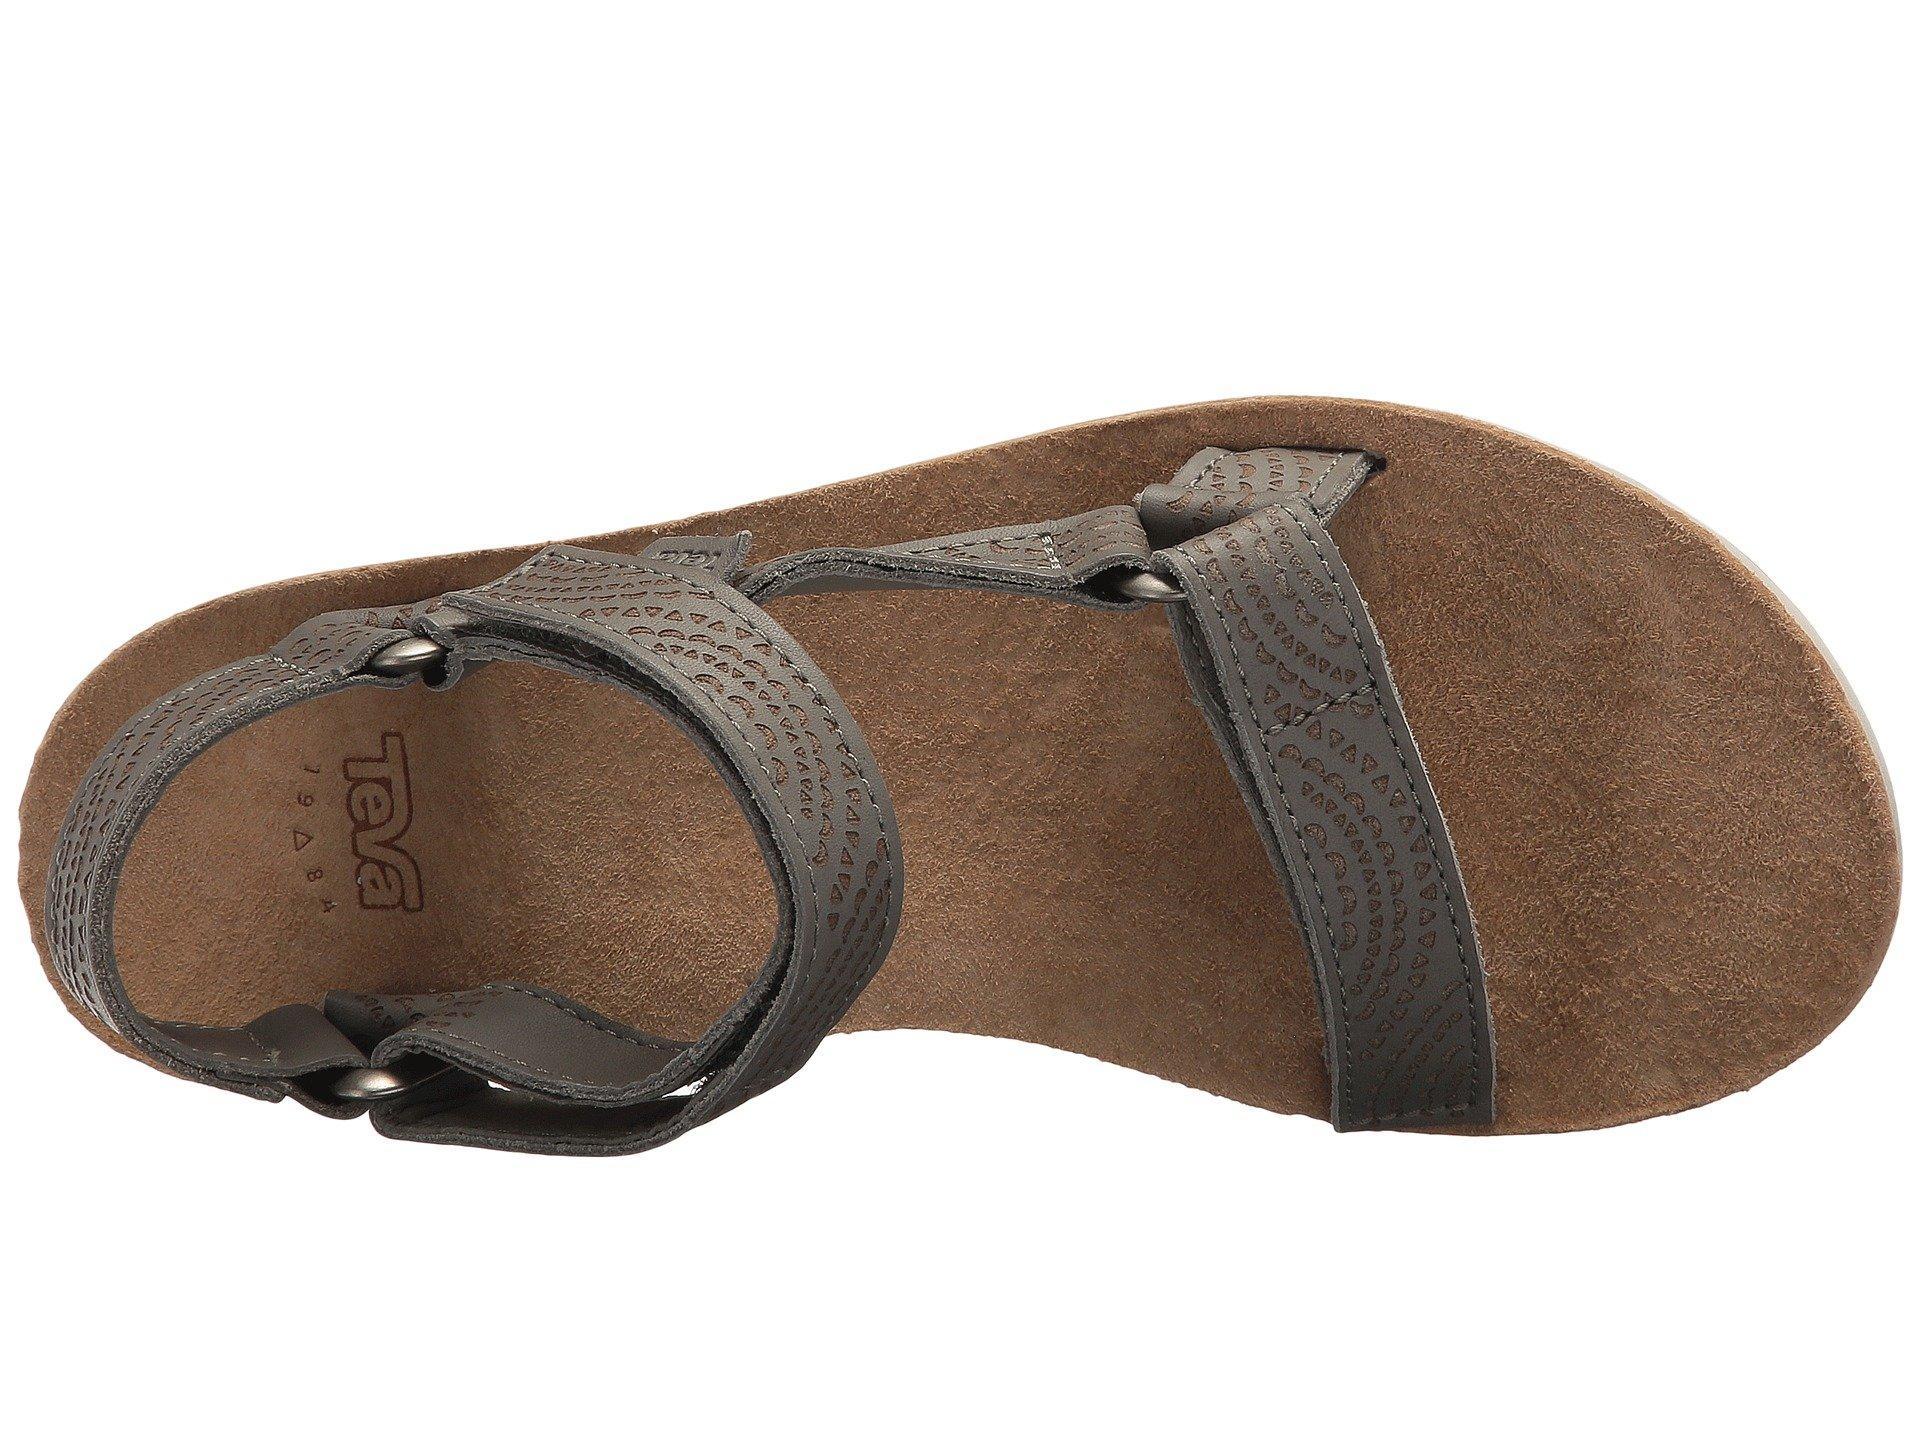 09086328a23c Teva - Multicolor Midform Universal Geometric (tan) Women s Shoes - Lyst.  View fullscreen